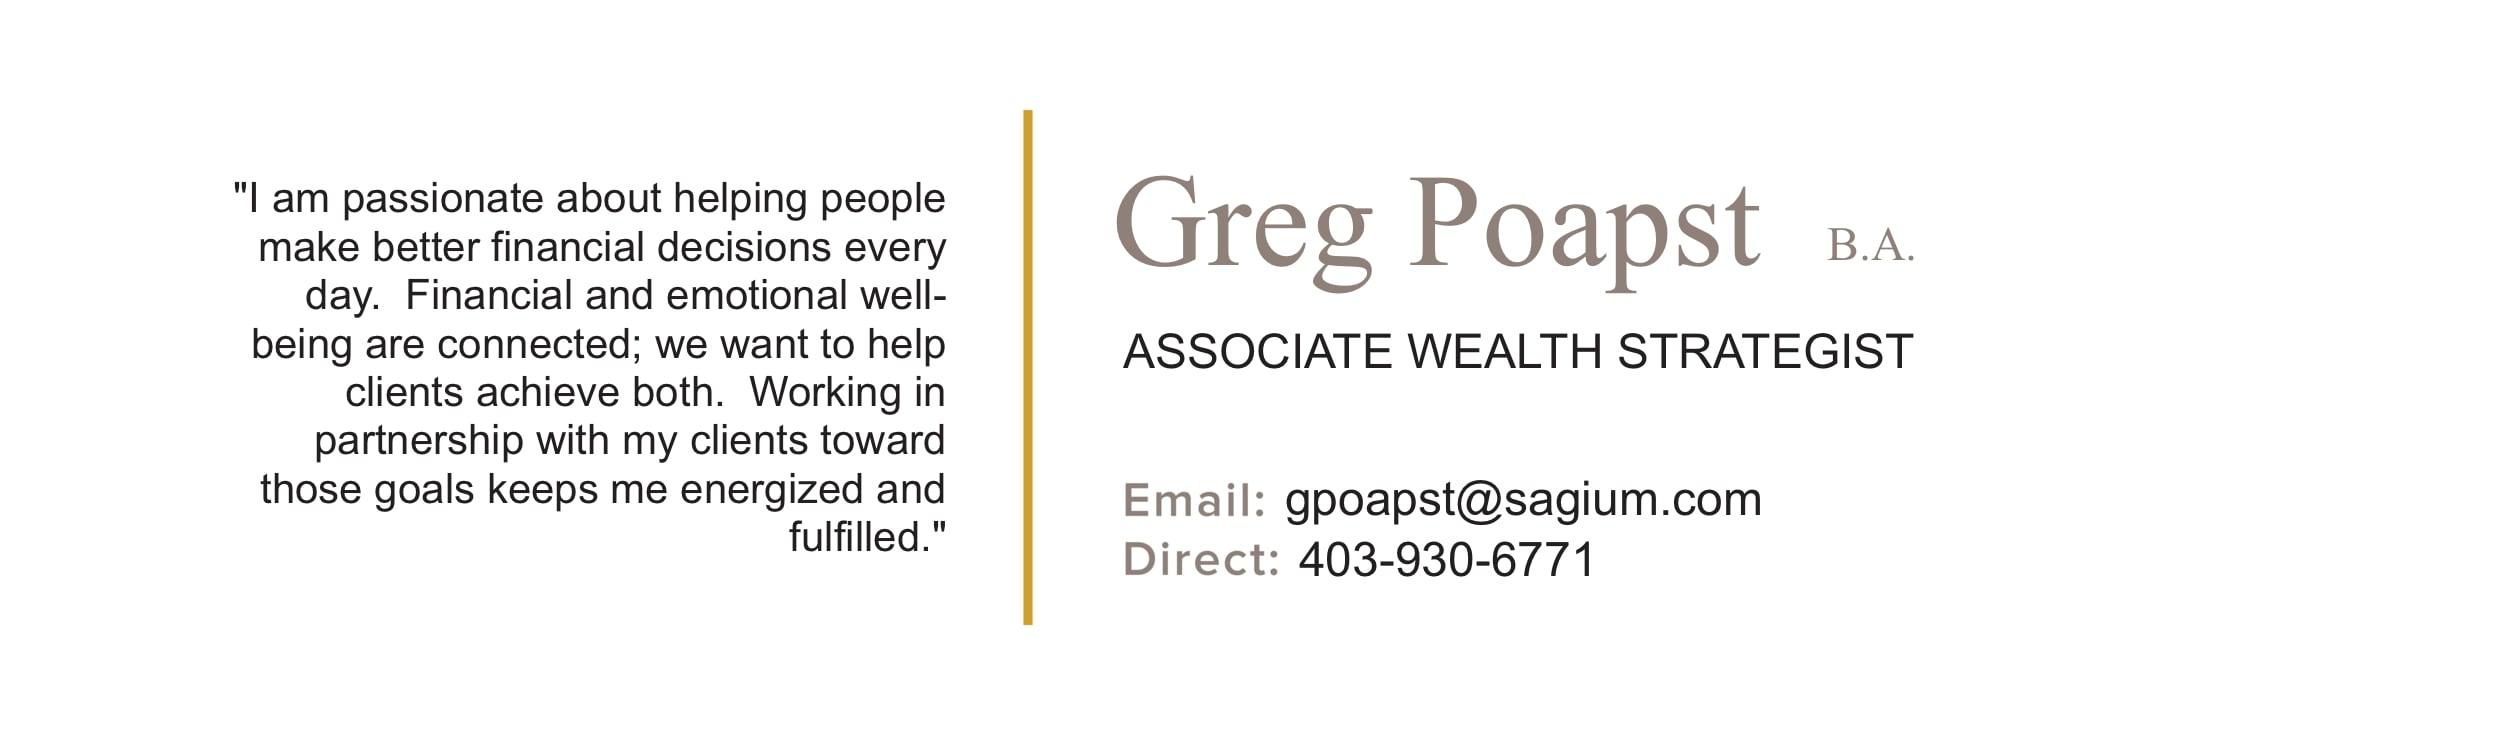 greg-poapst-card.jpg